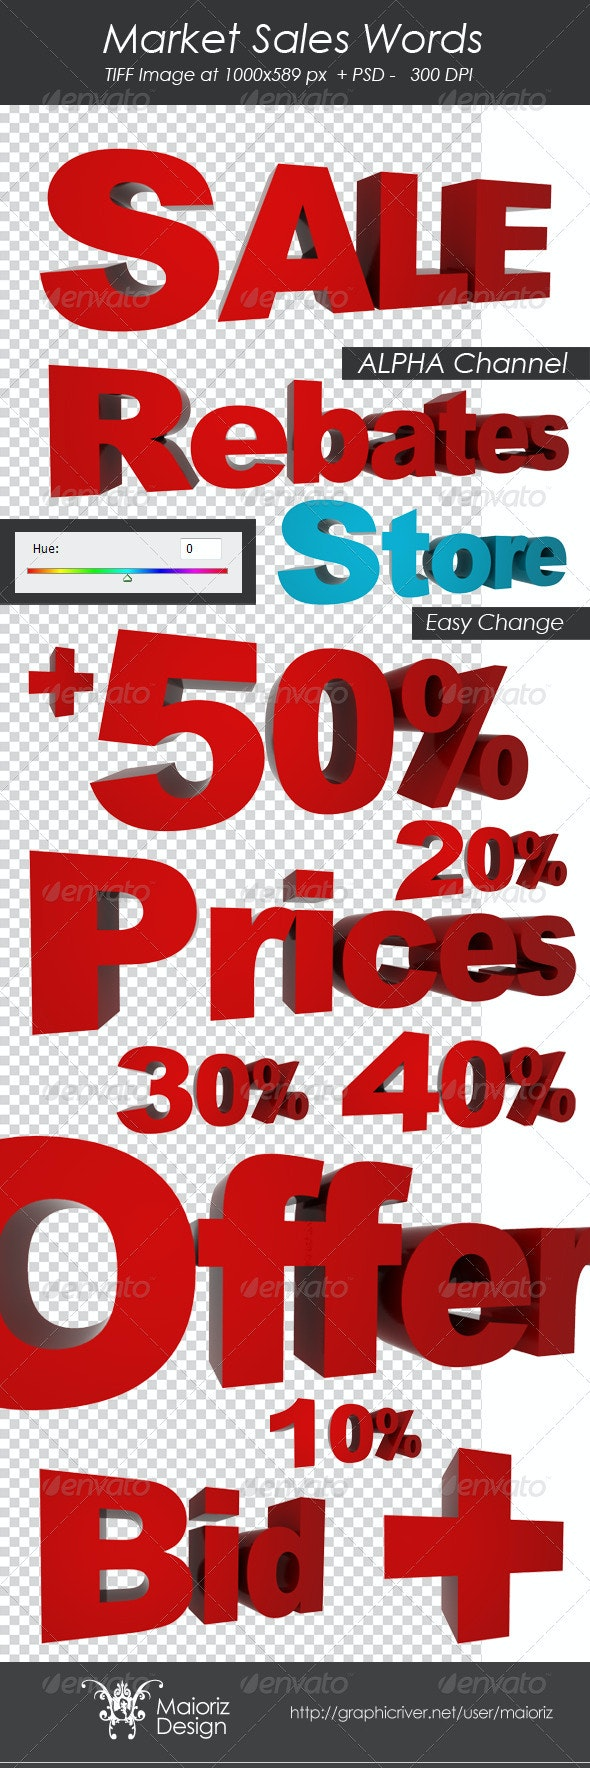 Market Sales - Text 3D Renders